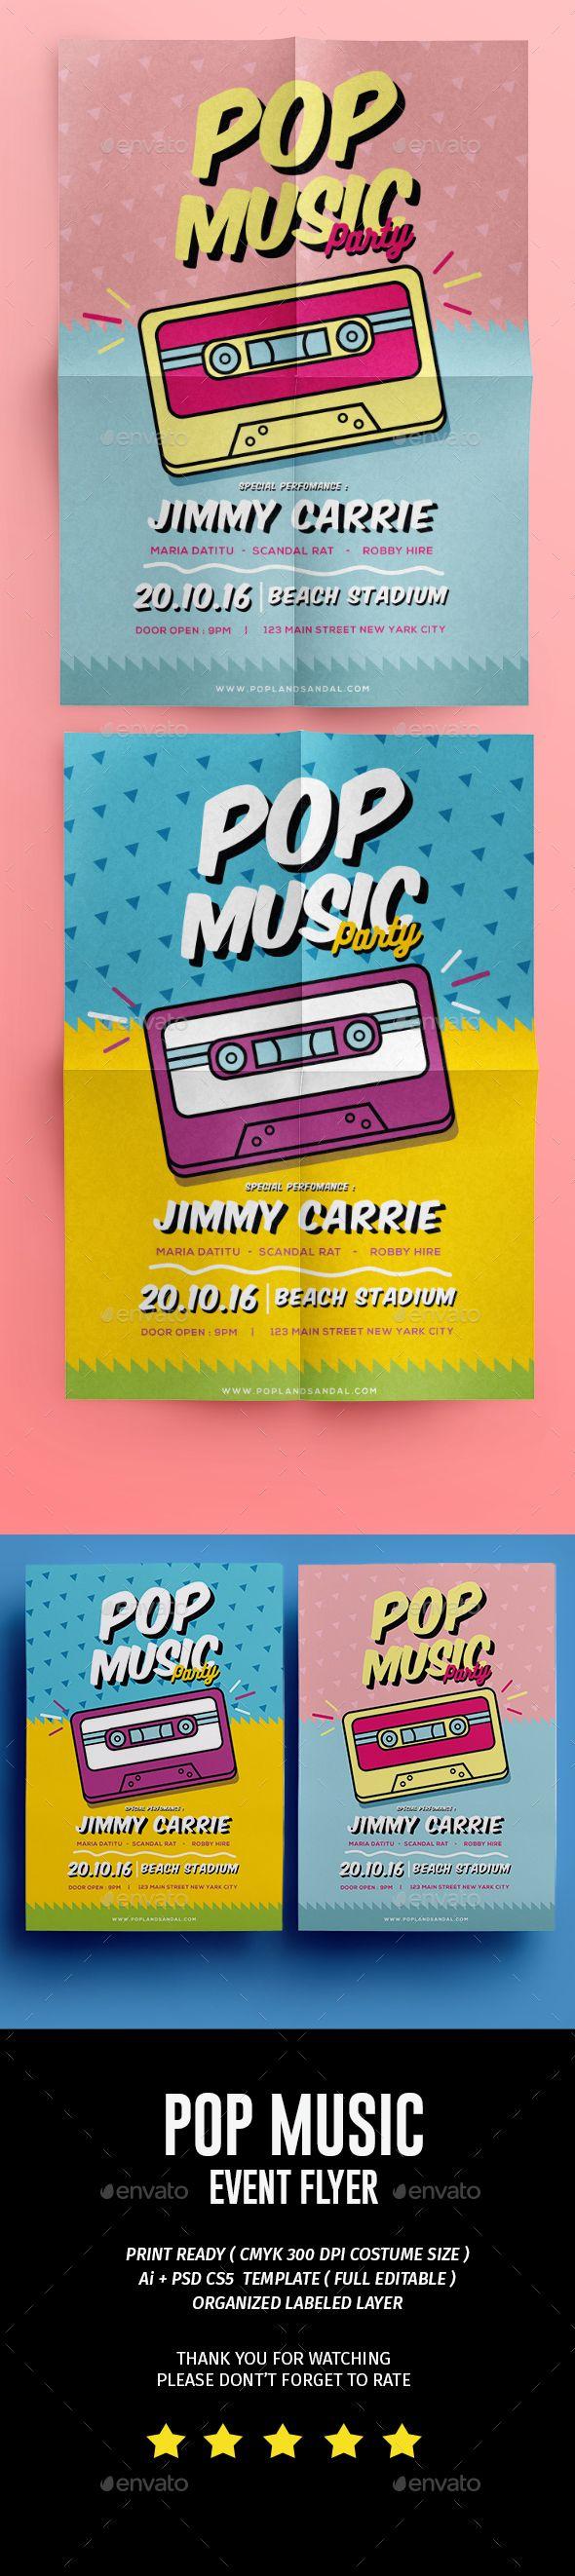 Pop Music Flyer Template PSD, AI Illustrator. Download here: https://graphicriver.net/item/pop-music-flyer/17494833?ref=ksioks